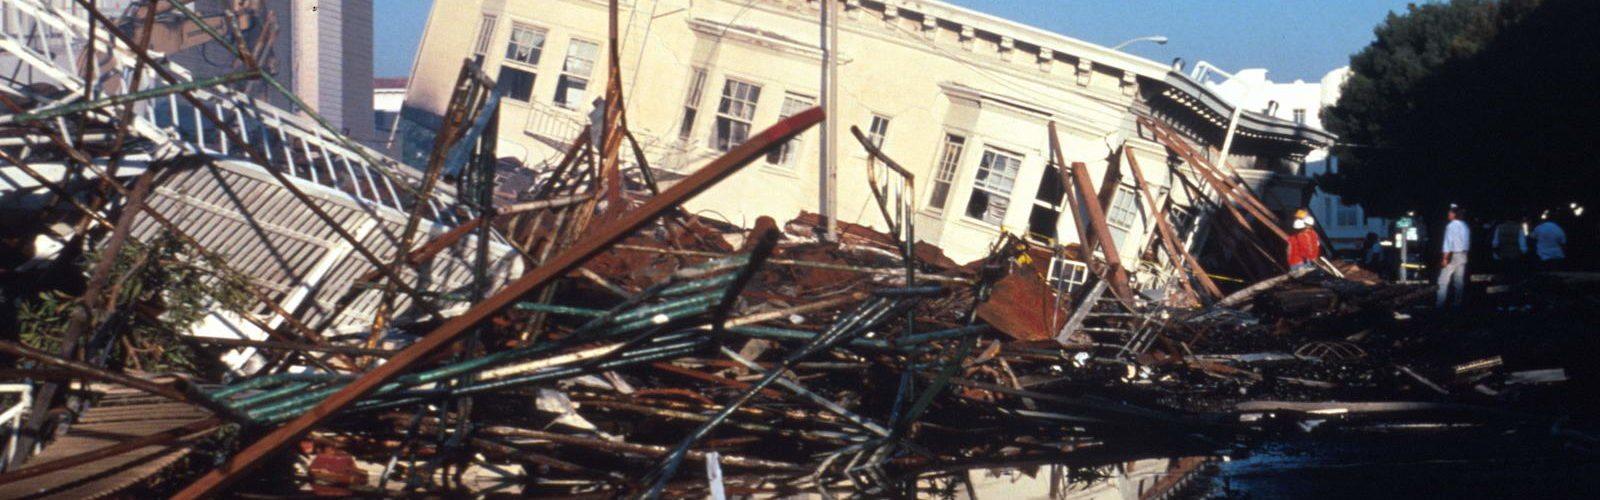 se-preparer-tremblements-terre-seisme-californie-featured